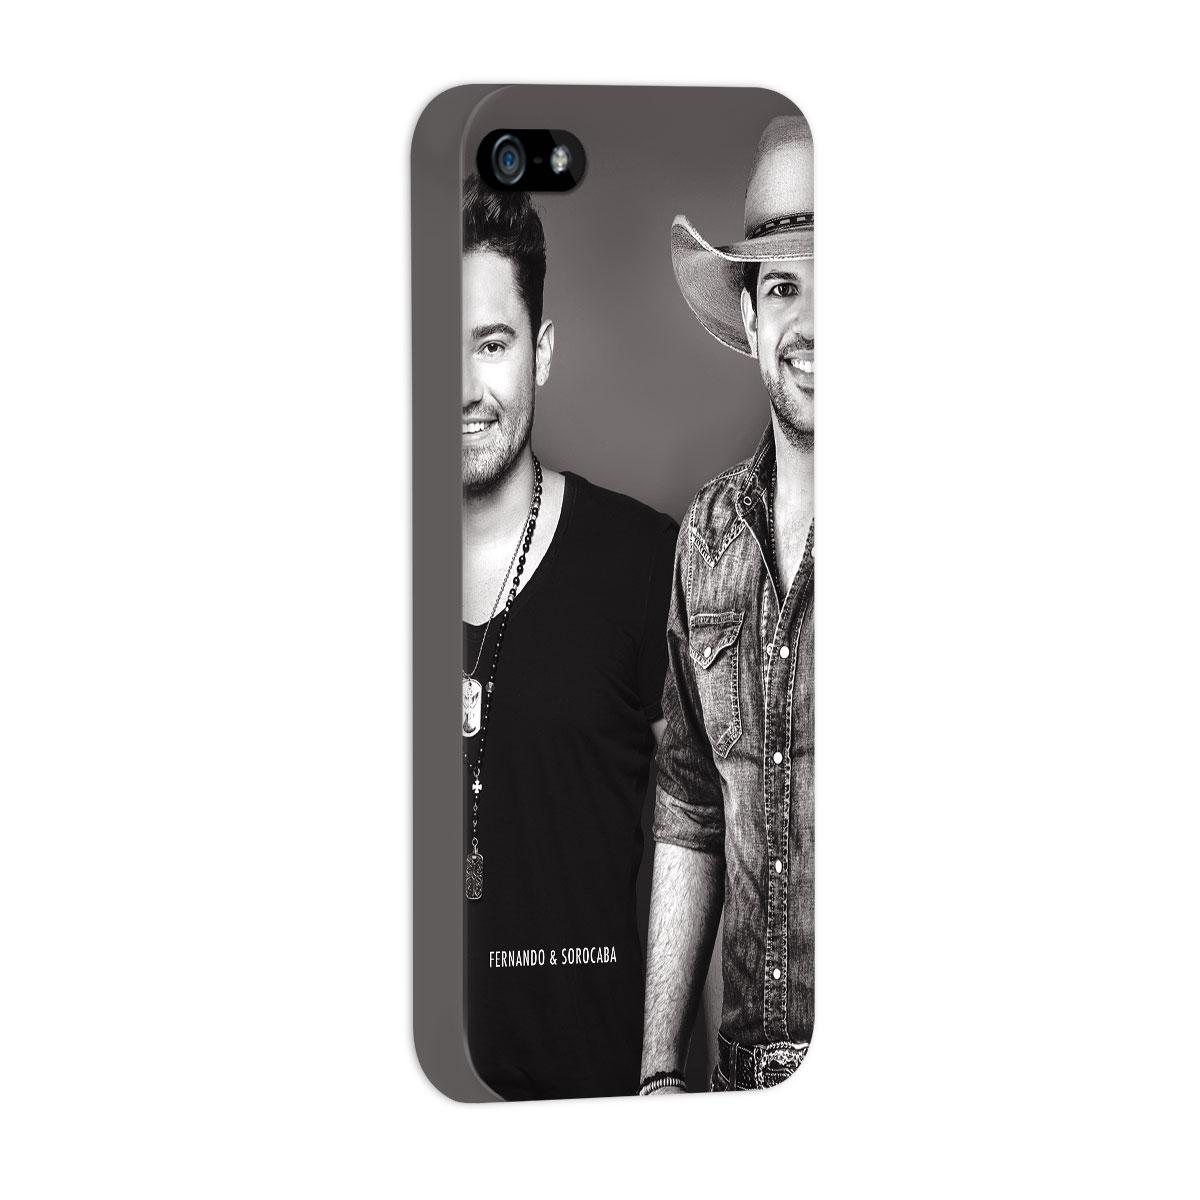 Capa para iPhone 5/5S Fernando & Sorocaba Foto PB